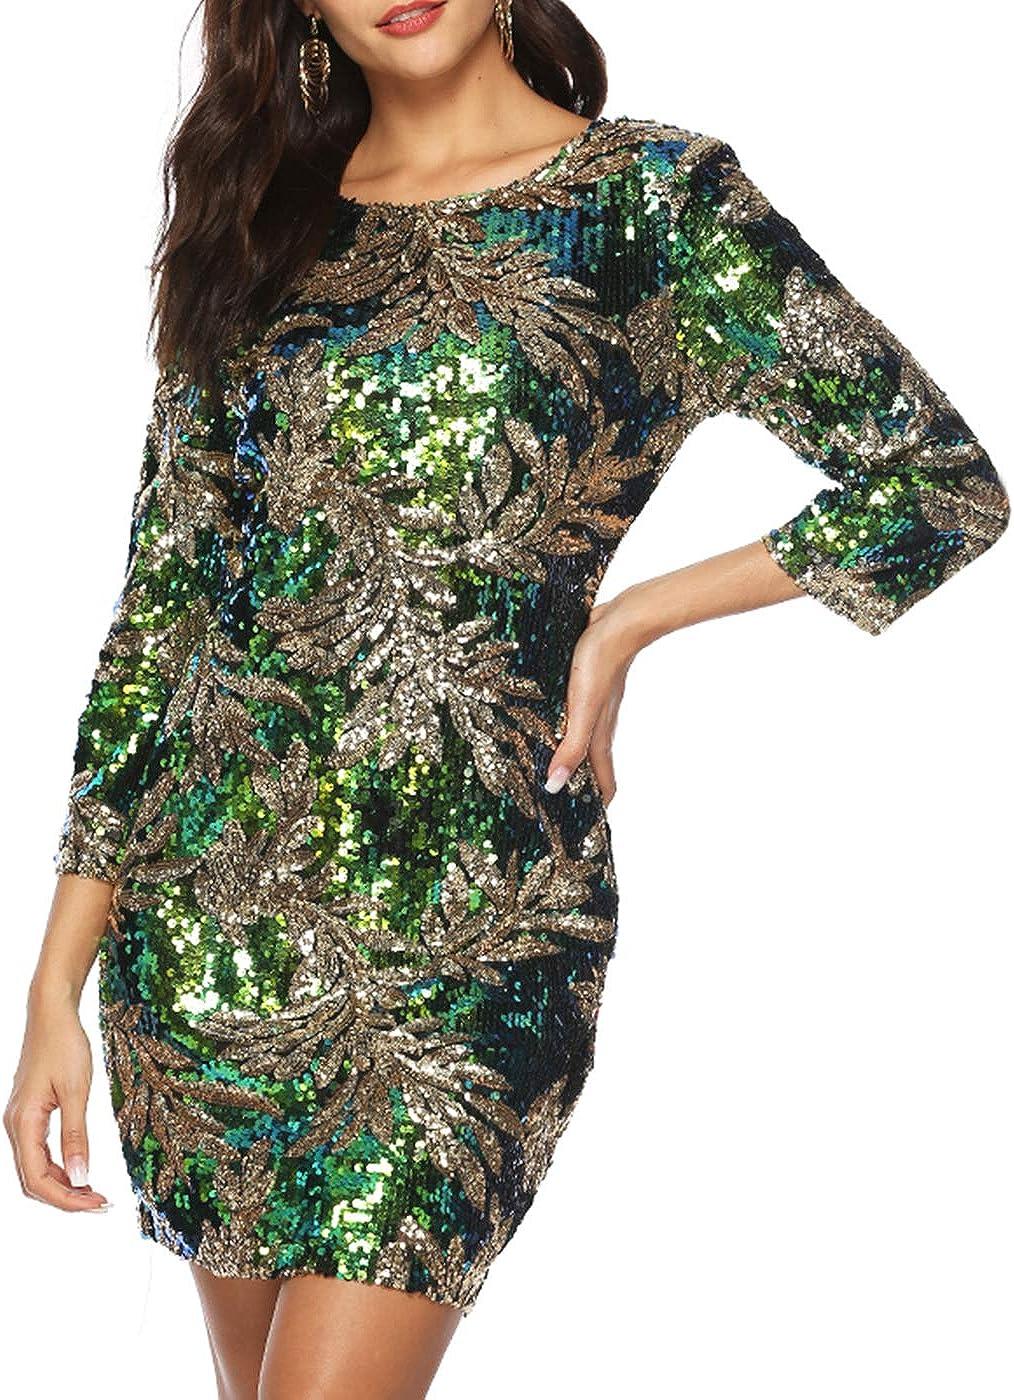 Zshujun Women's 1920s Glitter Sequin Mini Party Dress Club Bodycon Gowns 2467